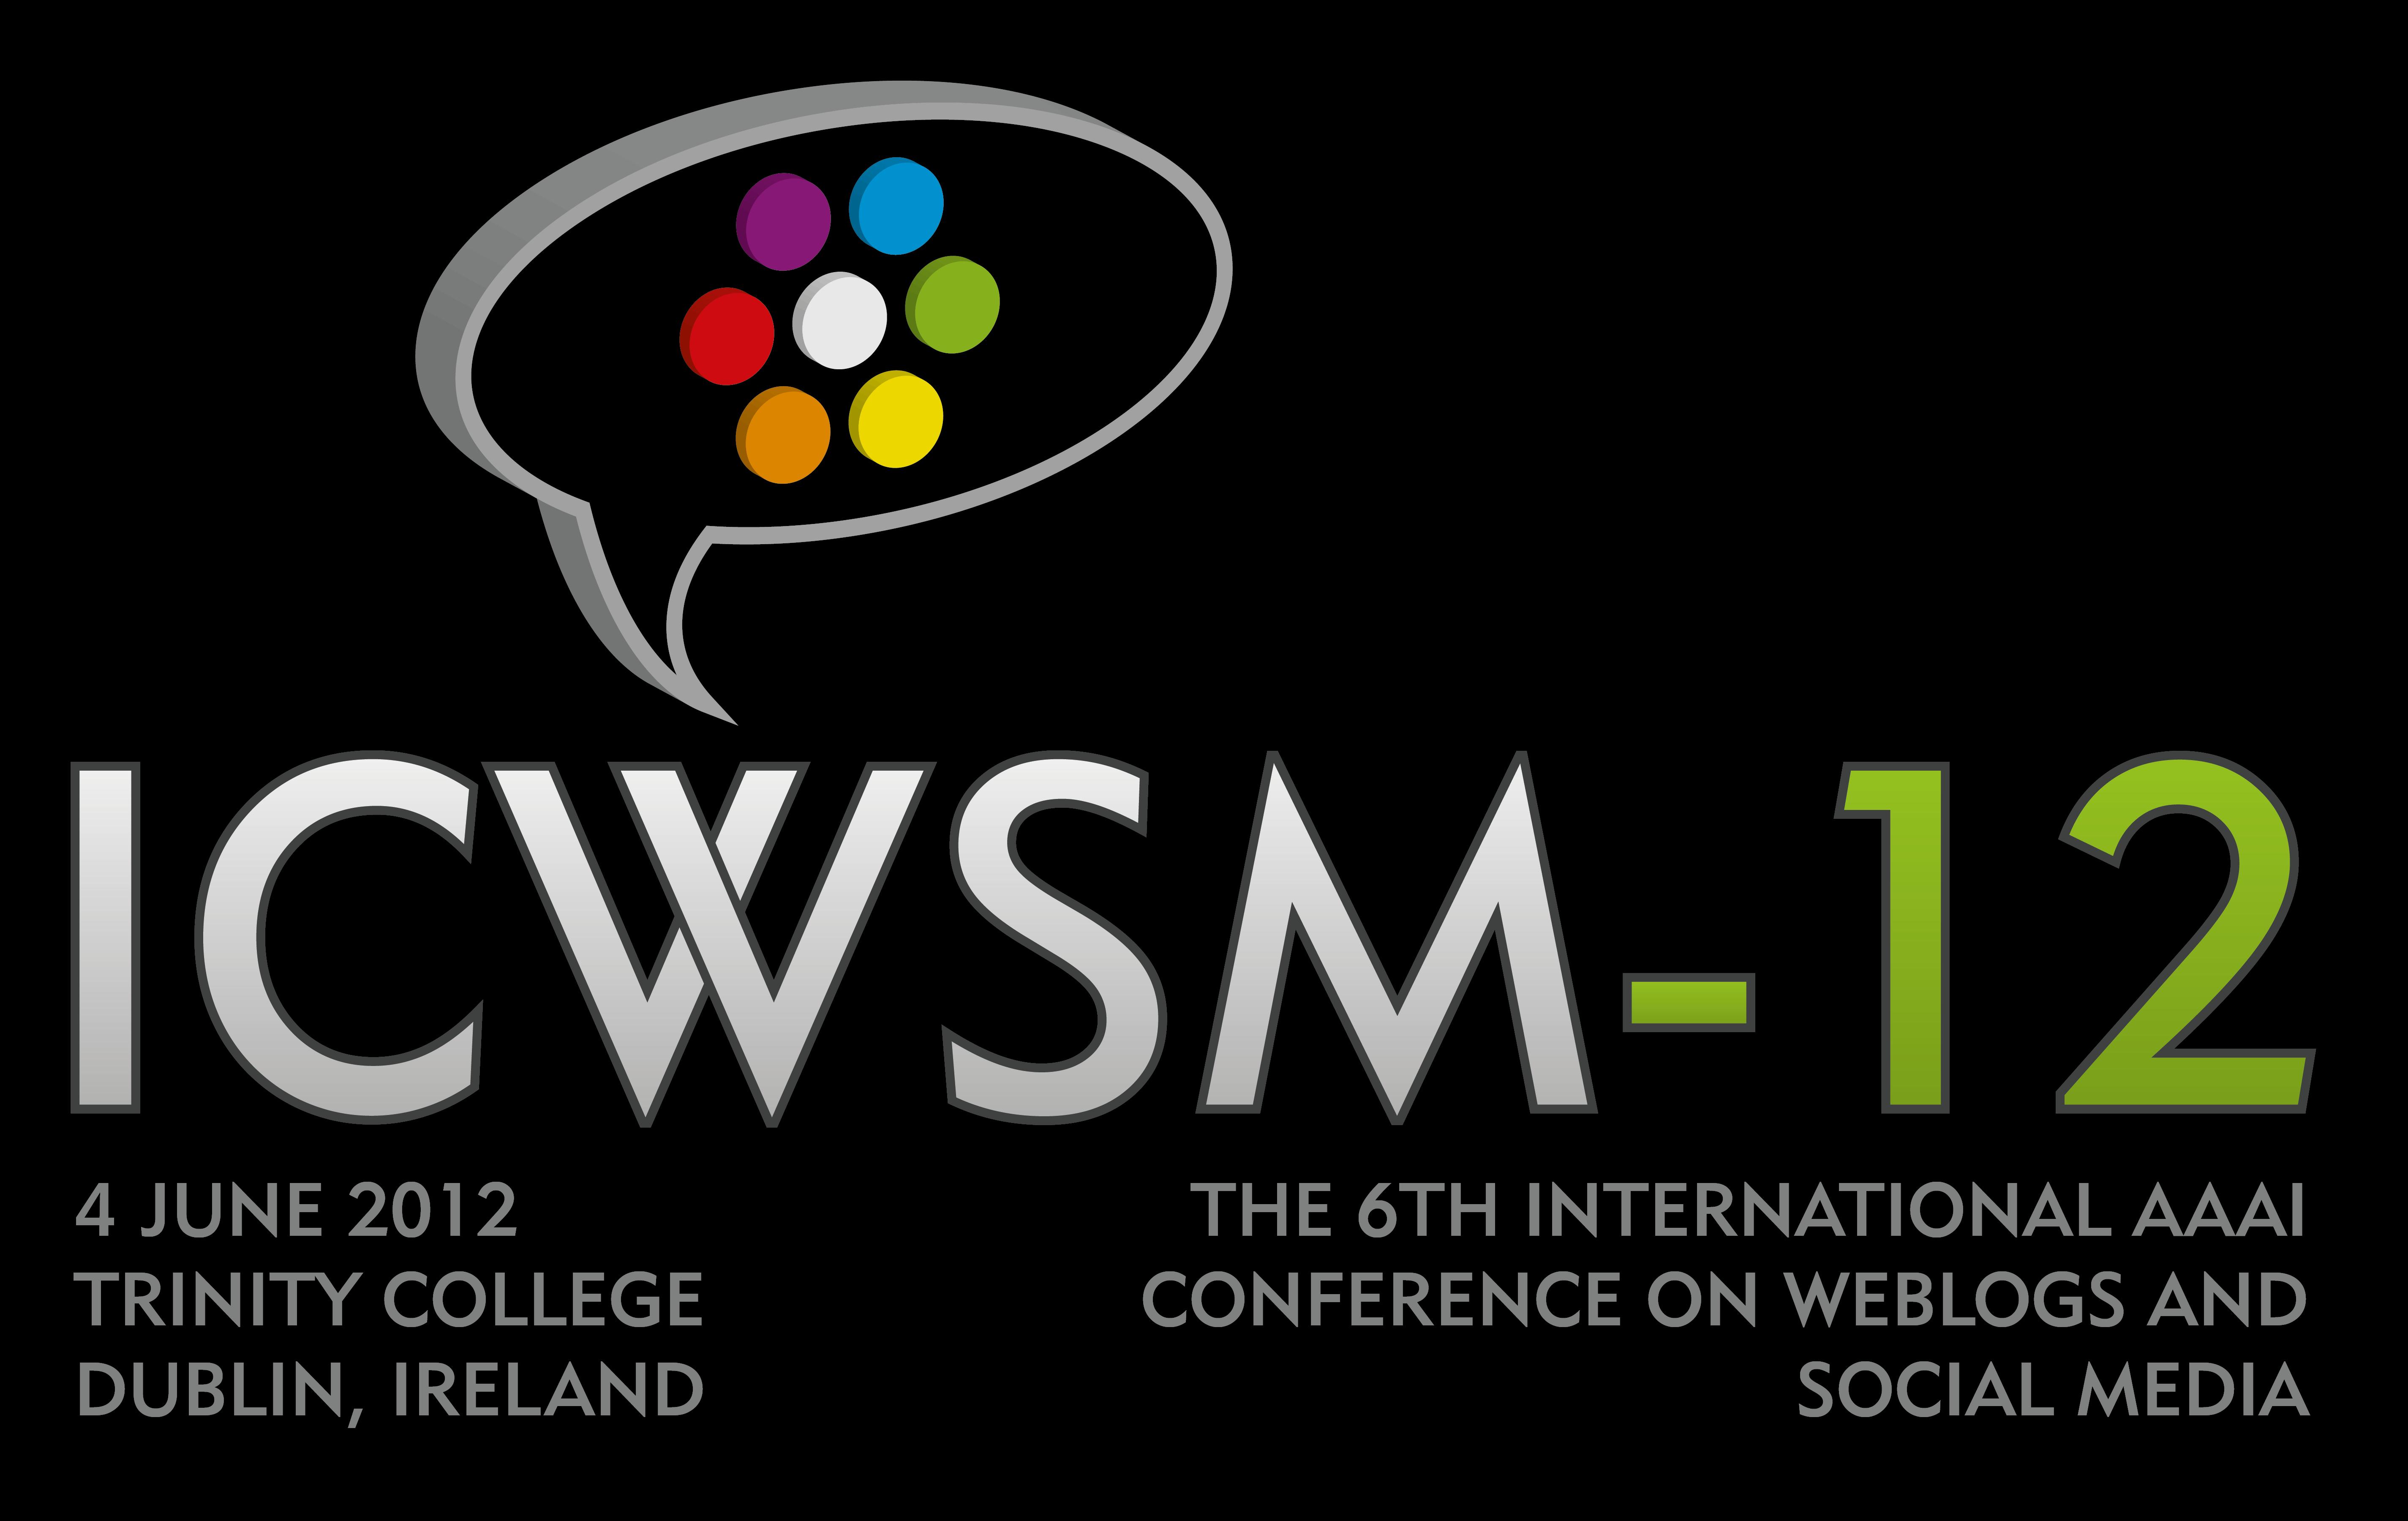 Media Logo Media. the conference logo is